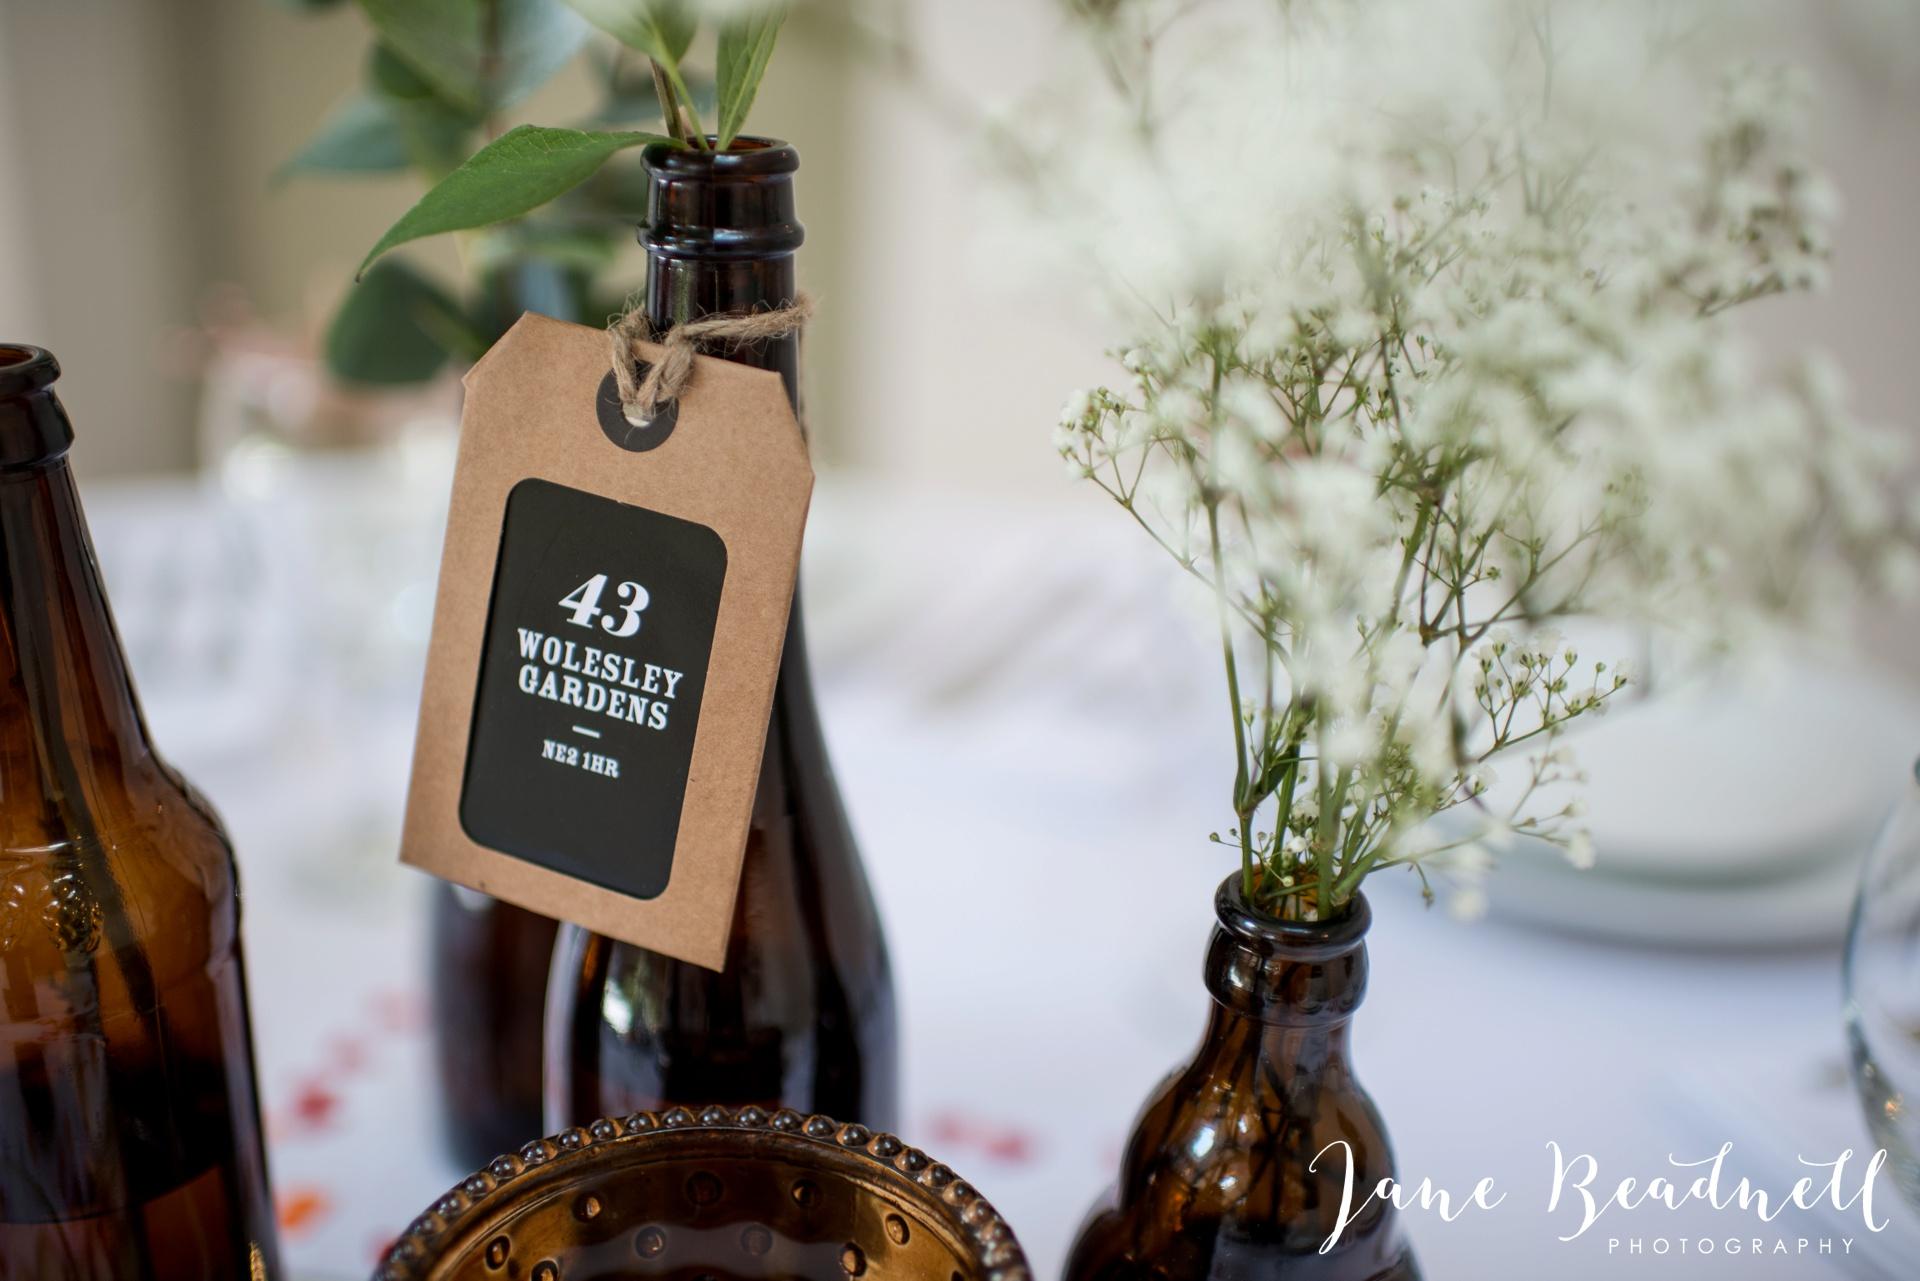 Jane Beadnell fine art wedding photographer The Cheerful Chilli Barn Otley_0005